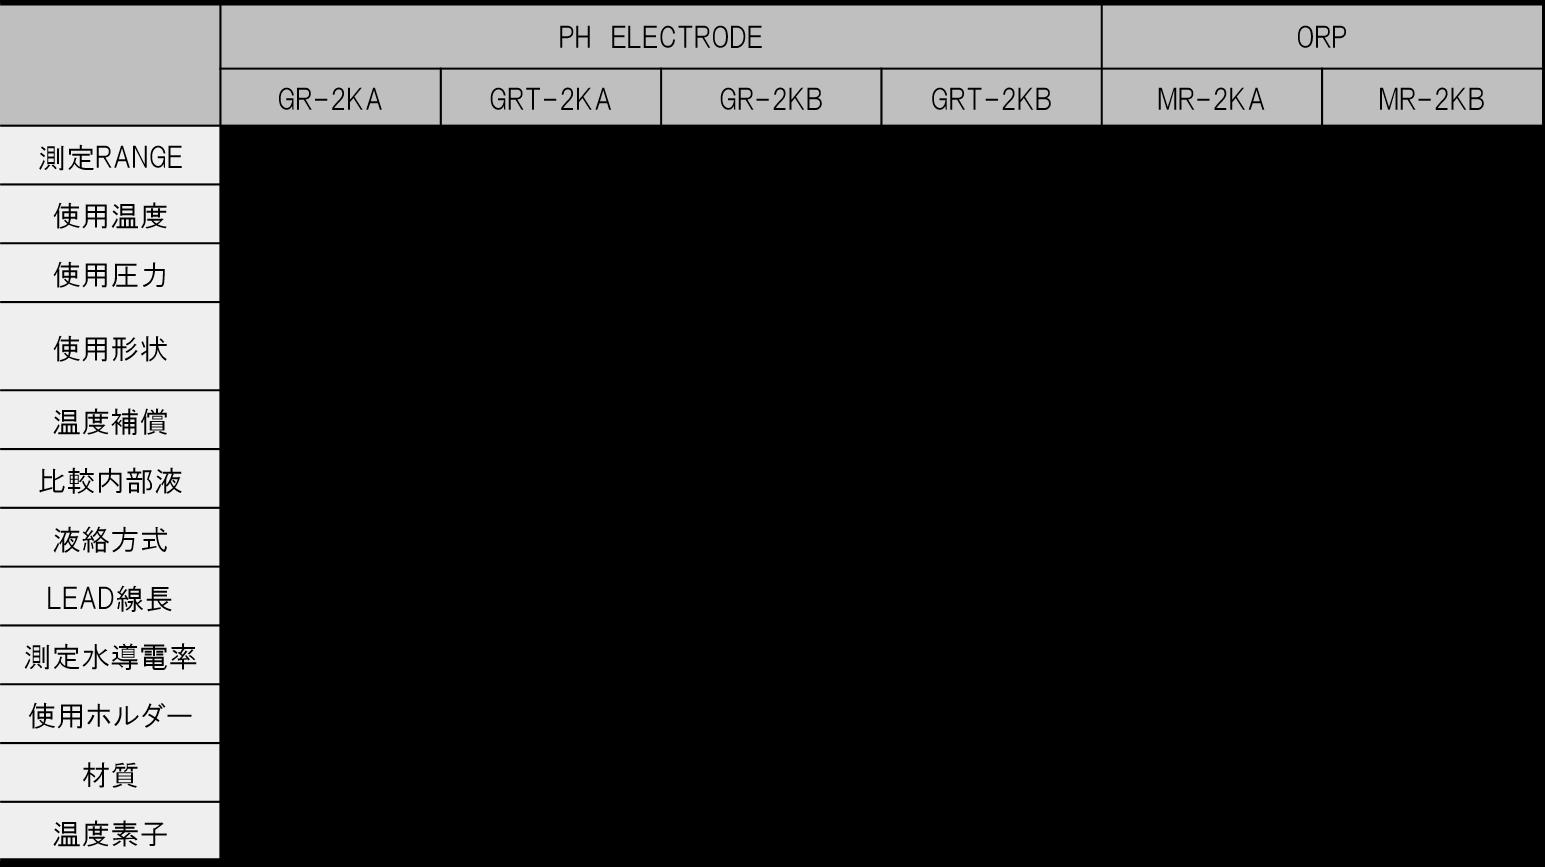 pH電極(KCL無補充)仕様